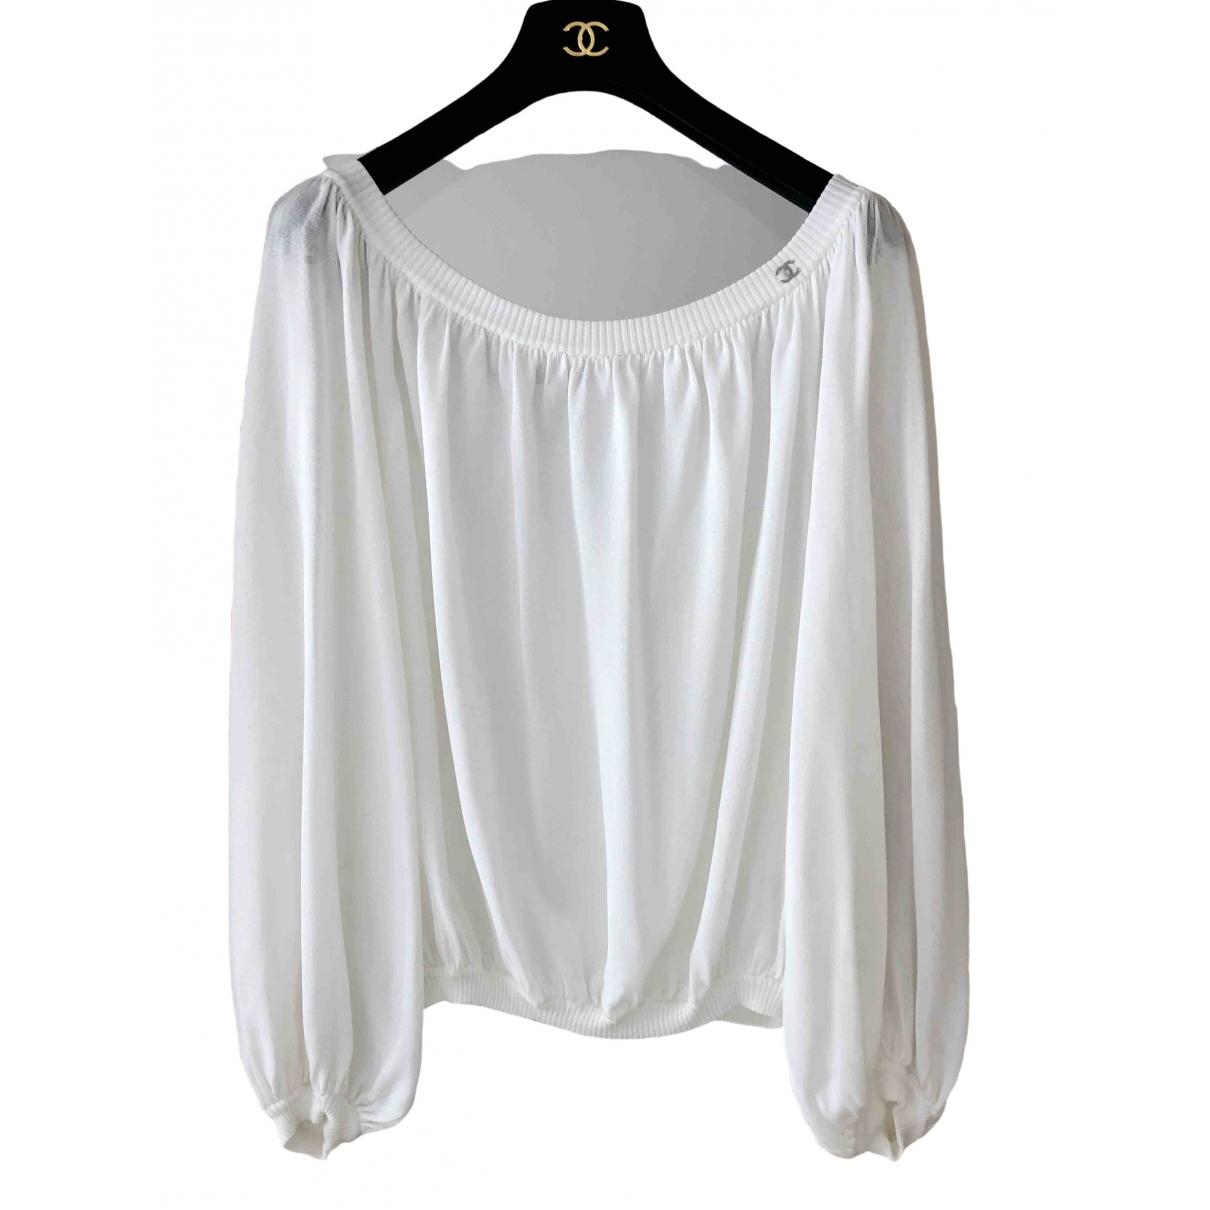 Chanel \N White  top for Women 38 FR